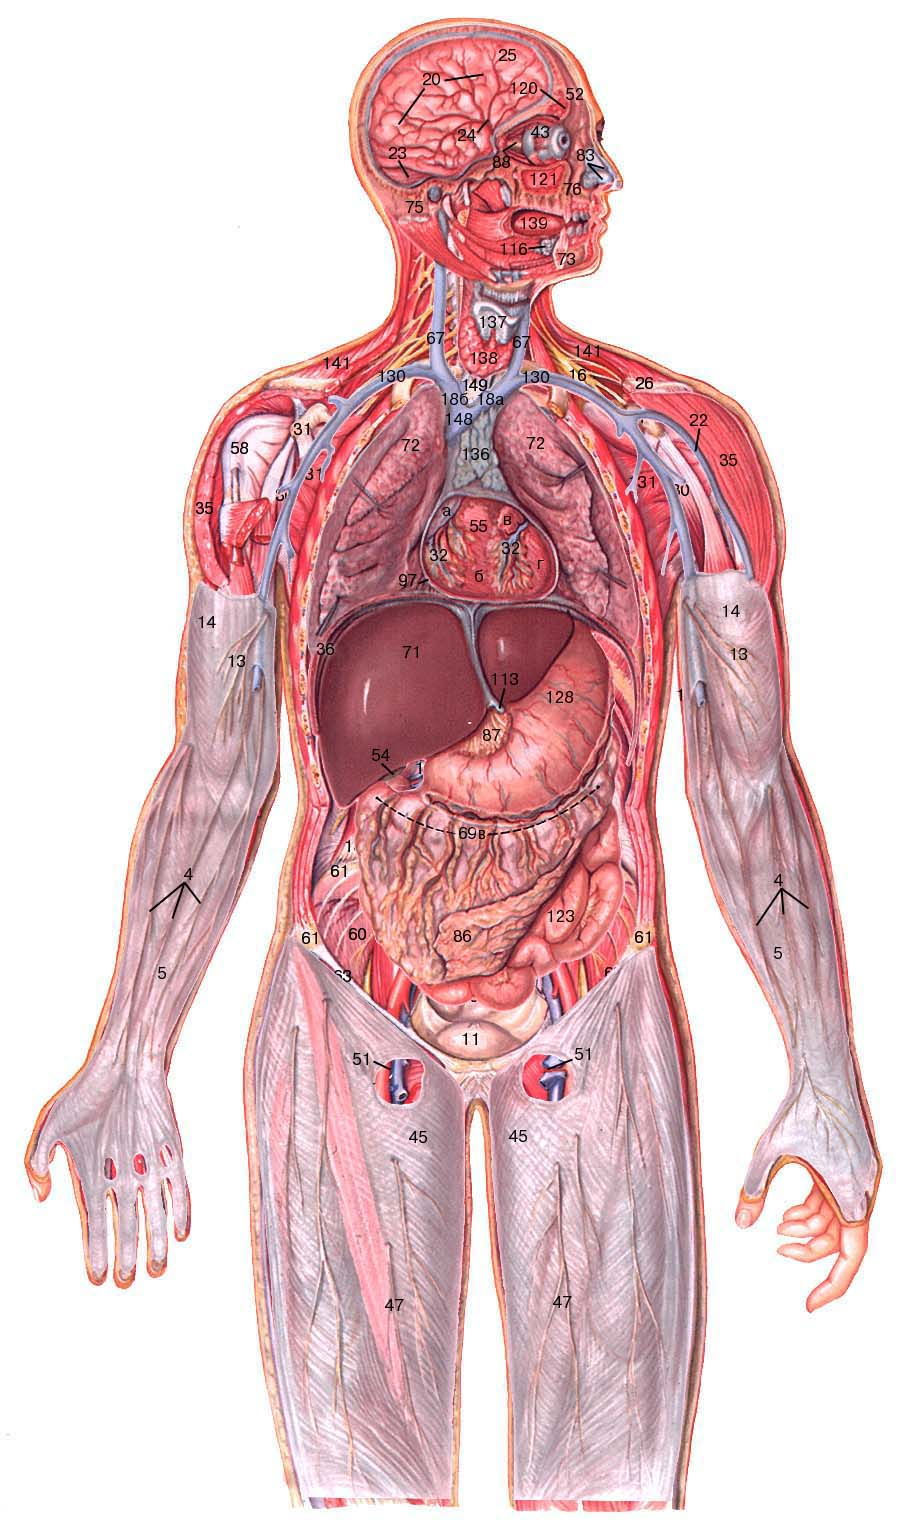 фото анатомии человека